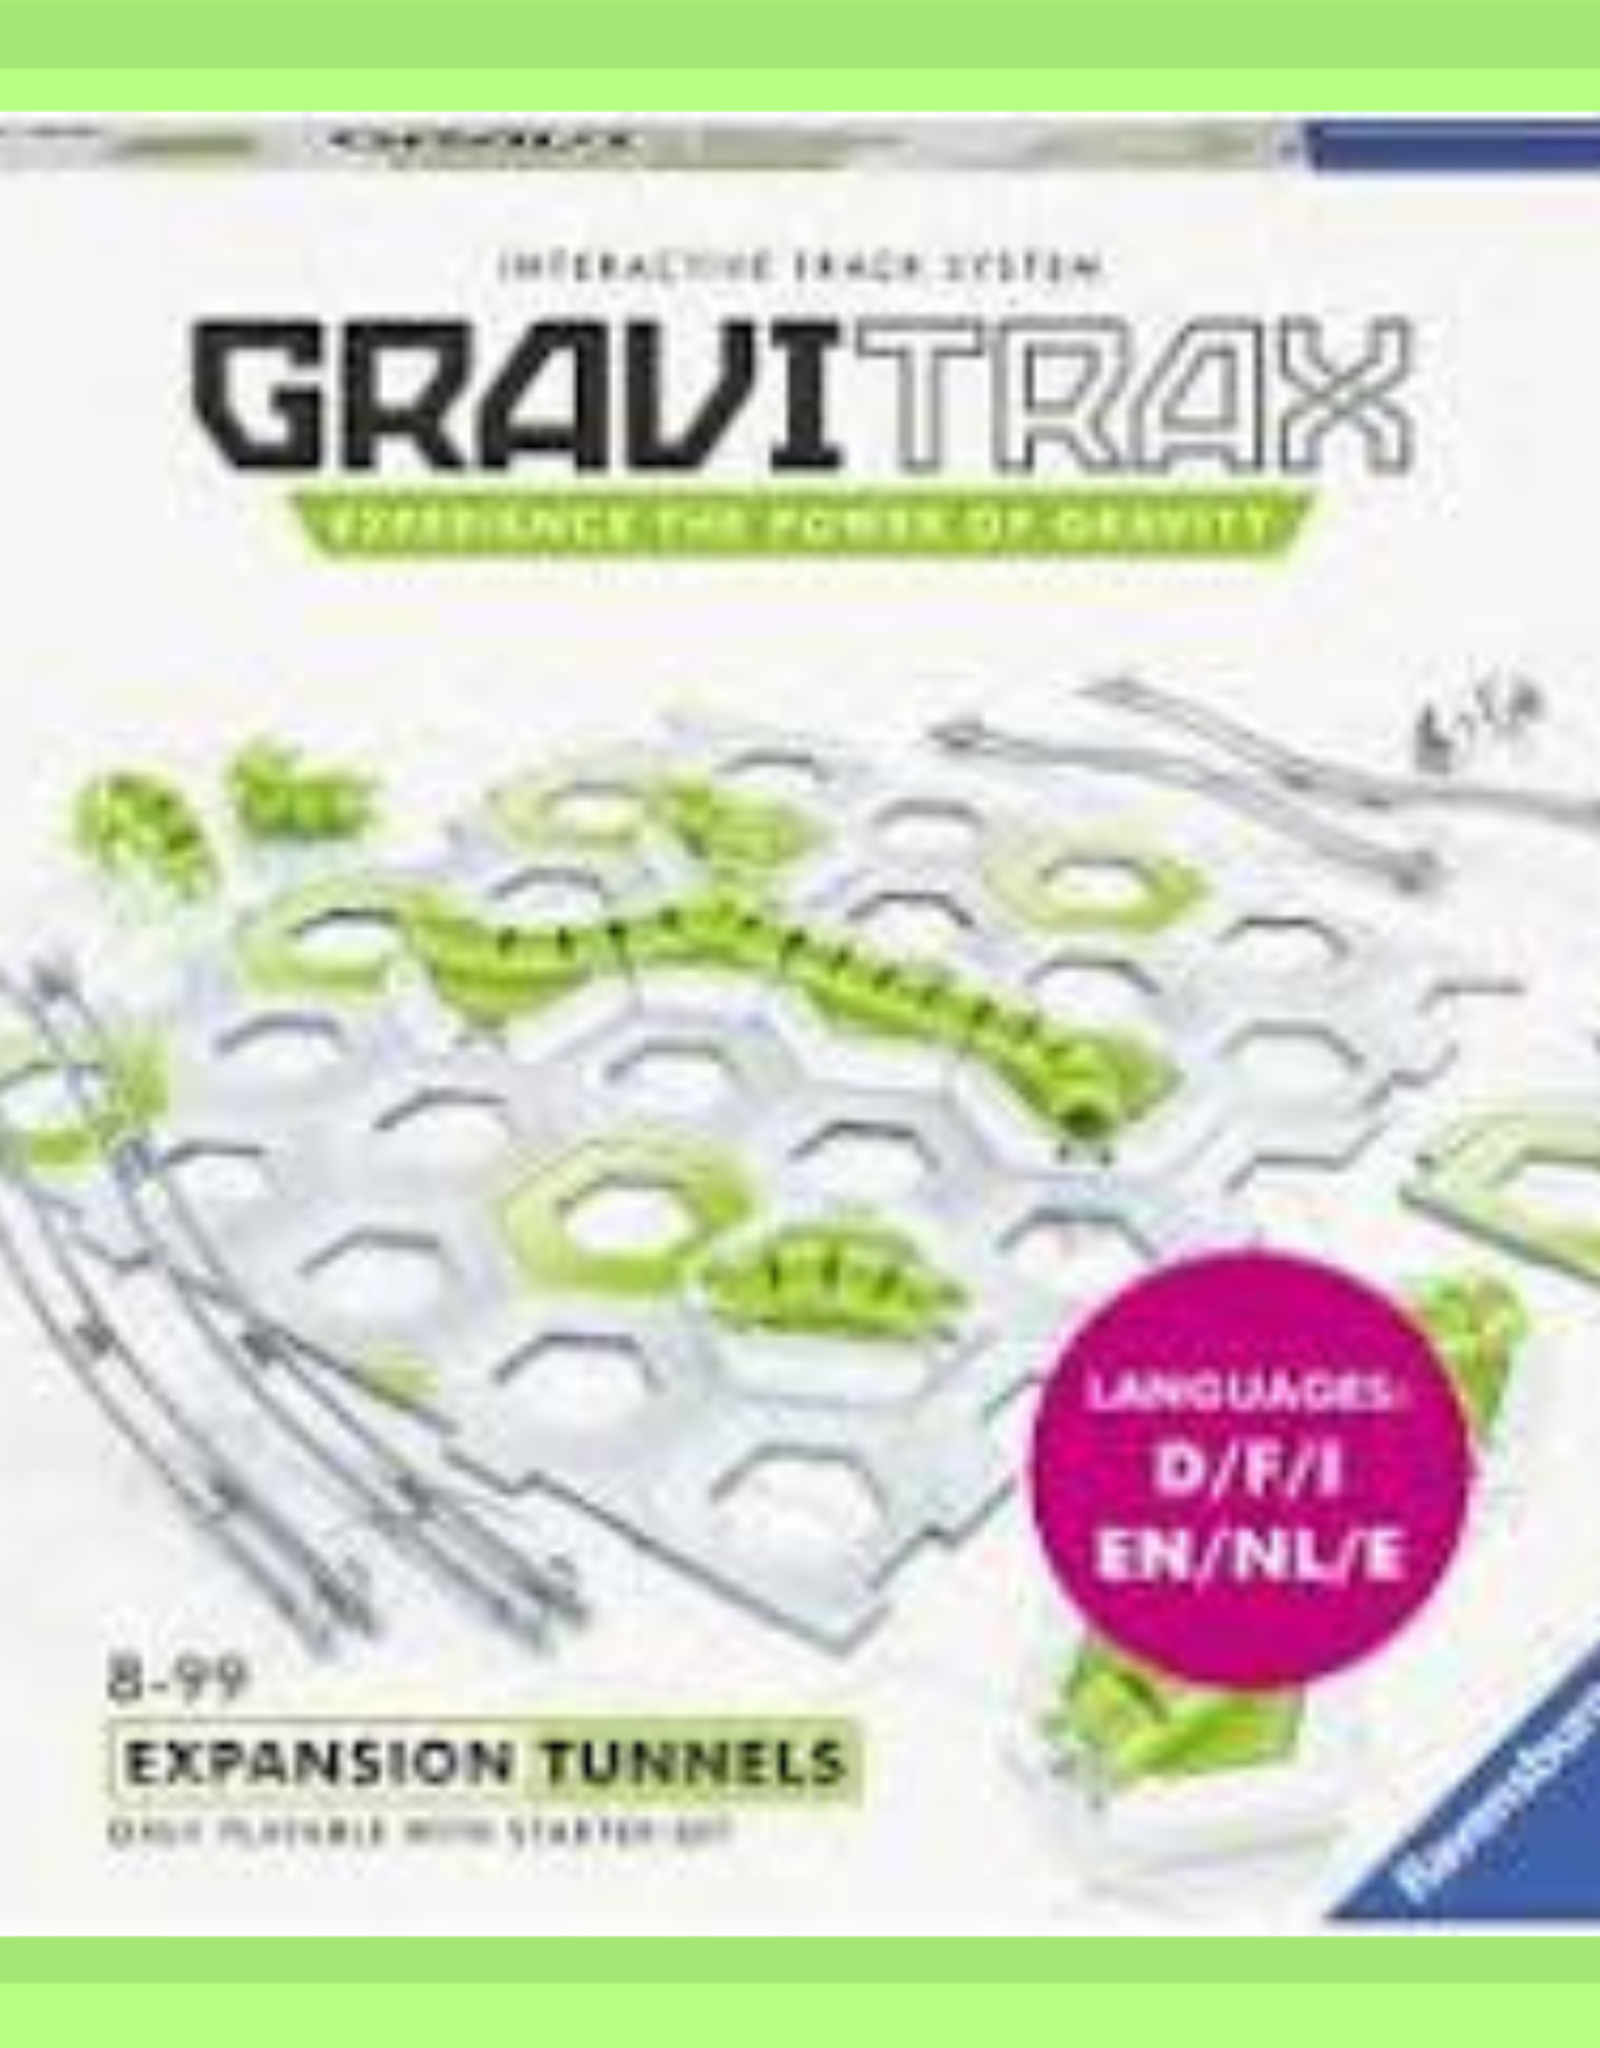 GRAVITRAX RAVENSBURGER TUNNELS EXPANSION